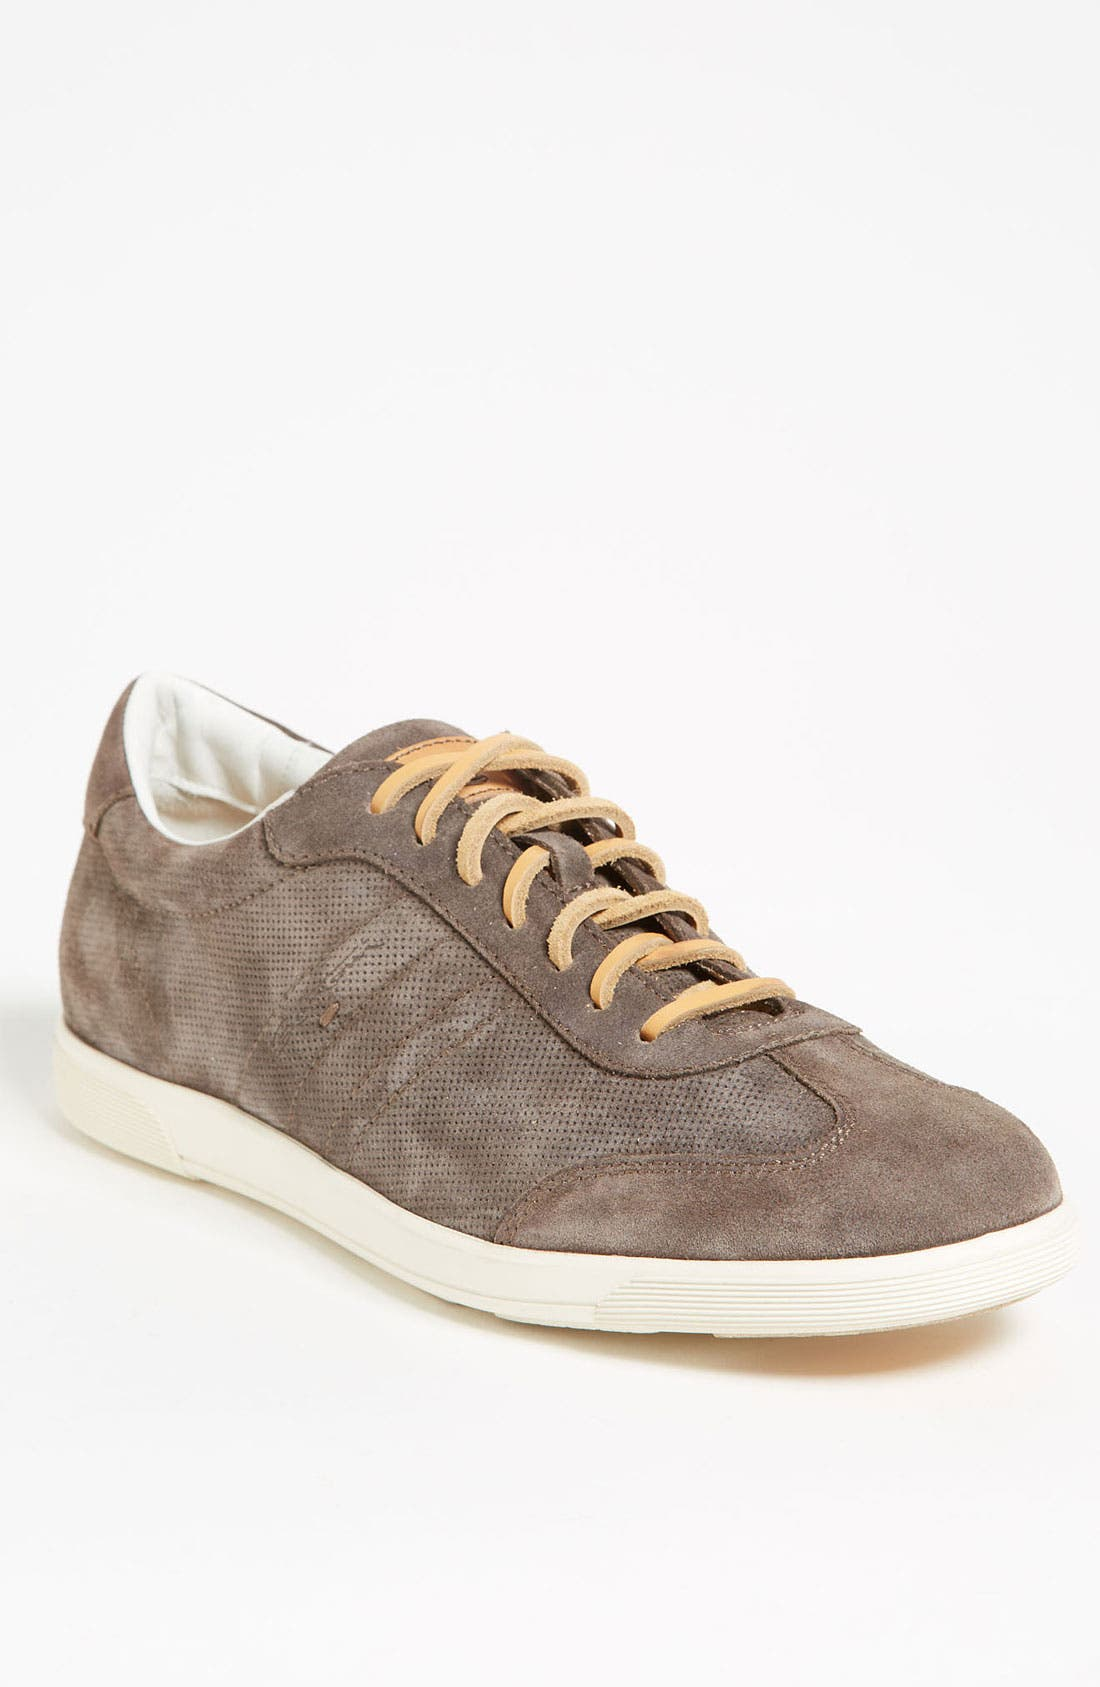 Alternate Image 1 Selected - Santoni 'Bonito' Sneaker